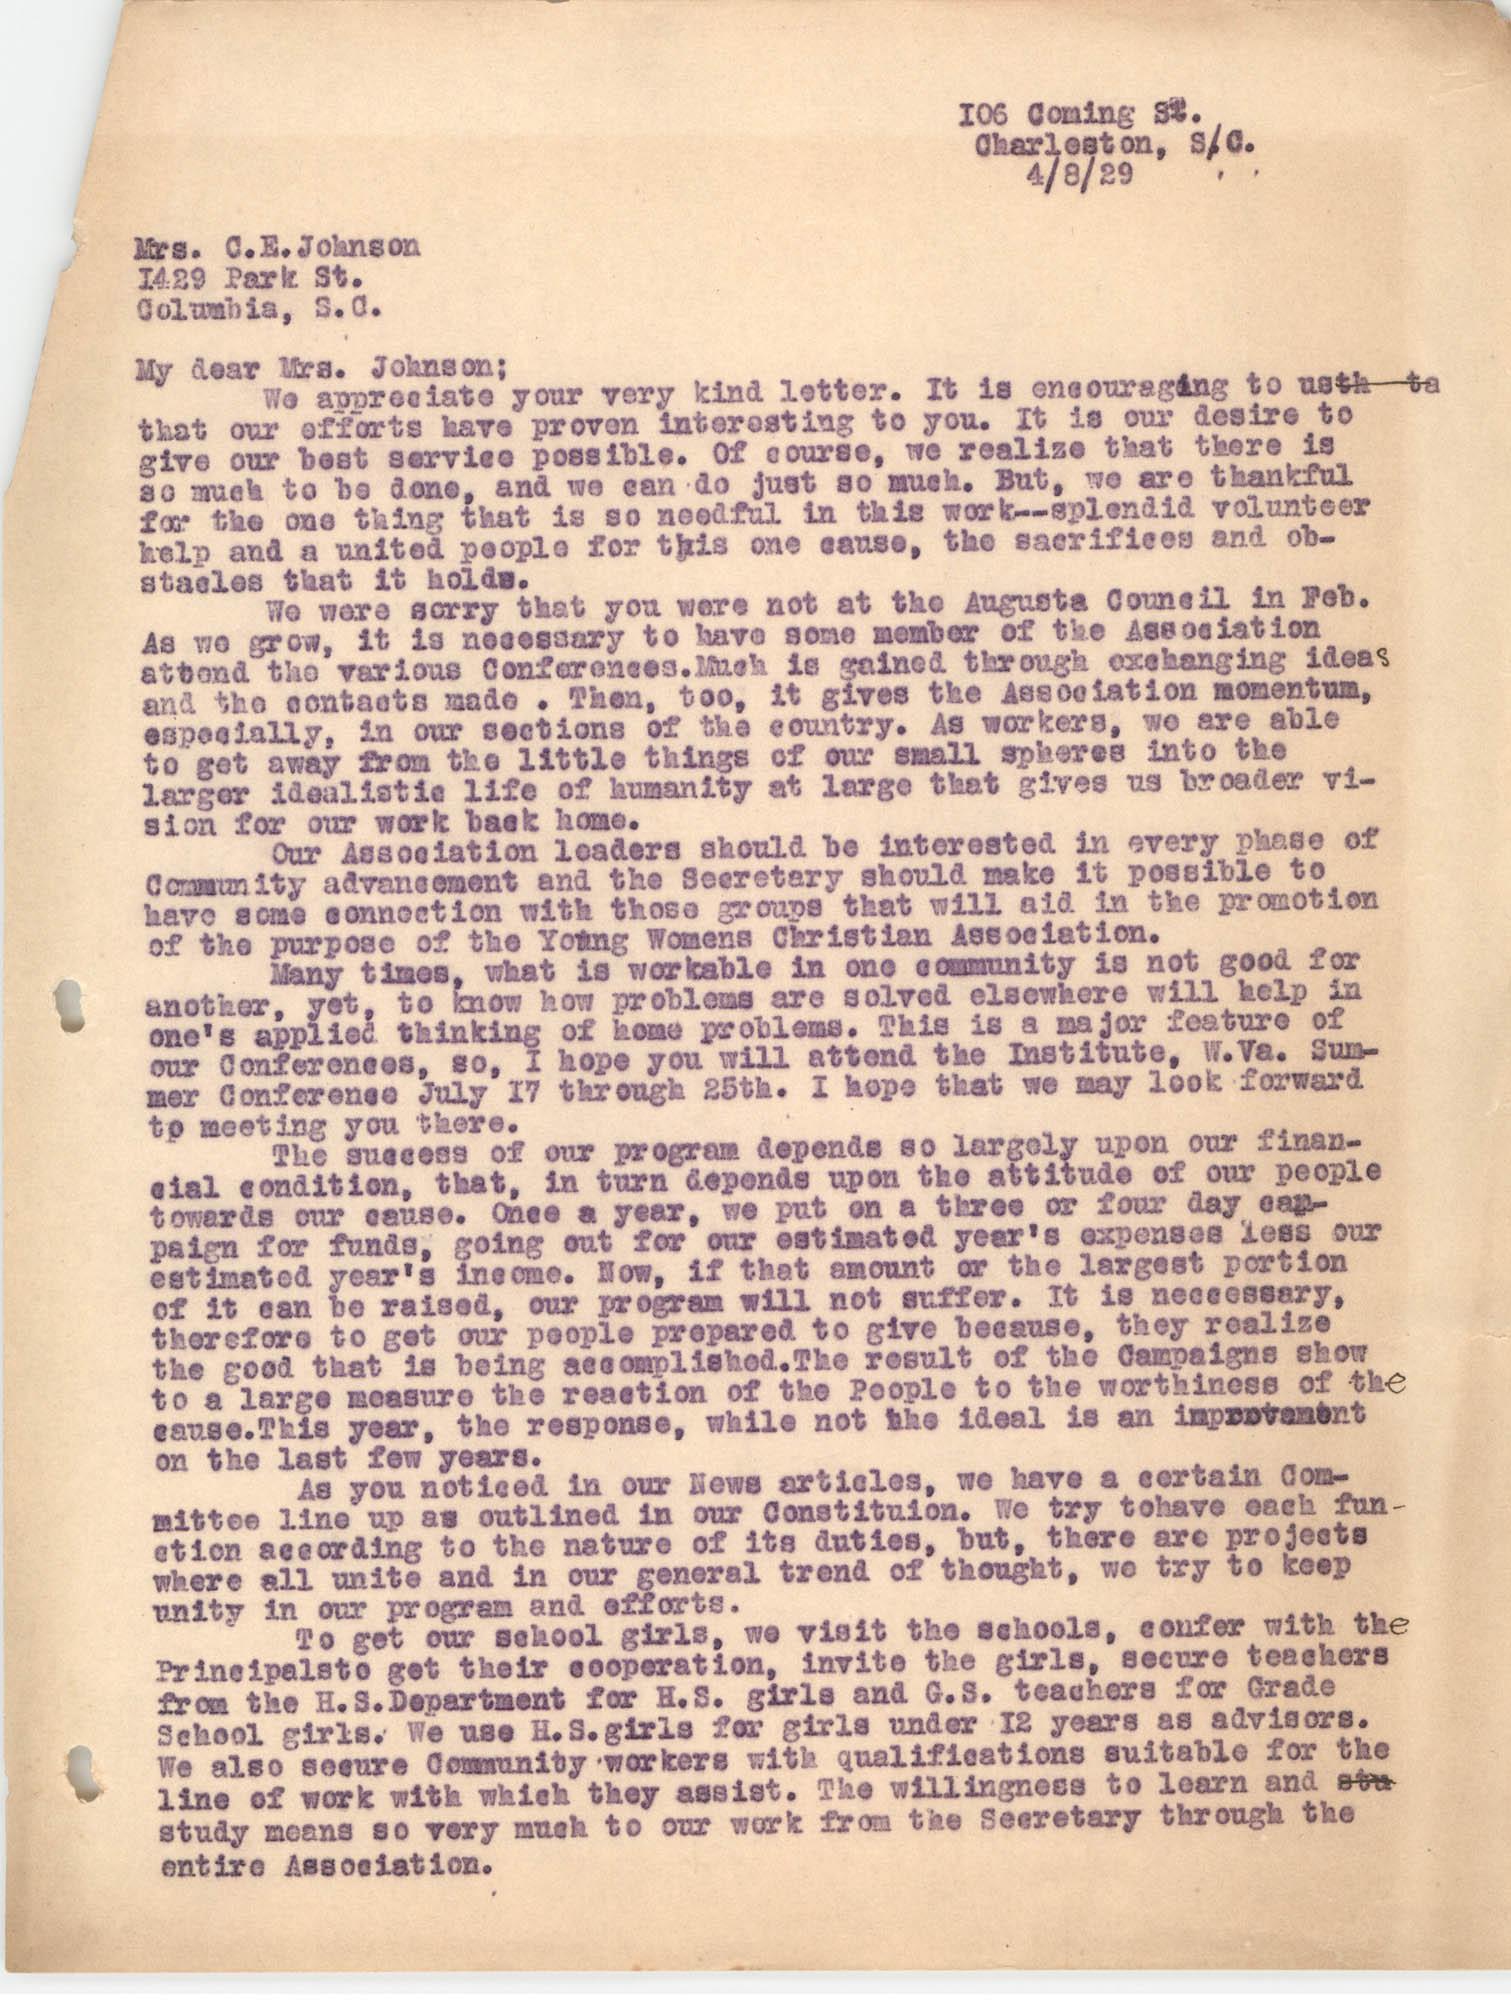 Letter from Ella L. Smyrl to C. E. Johnson, April 8, 1929